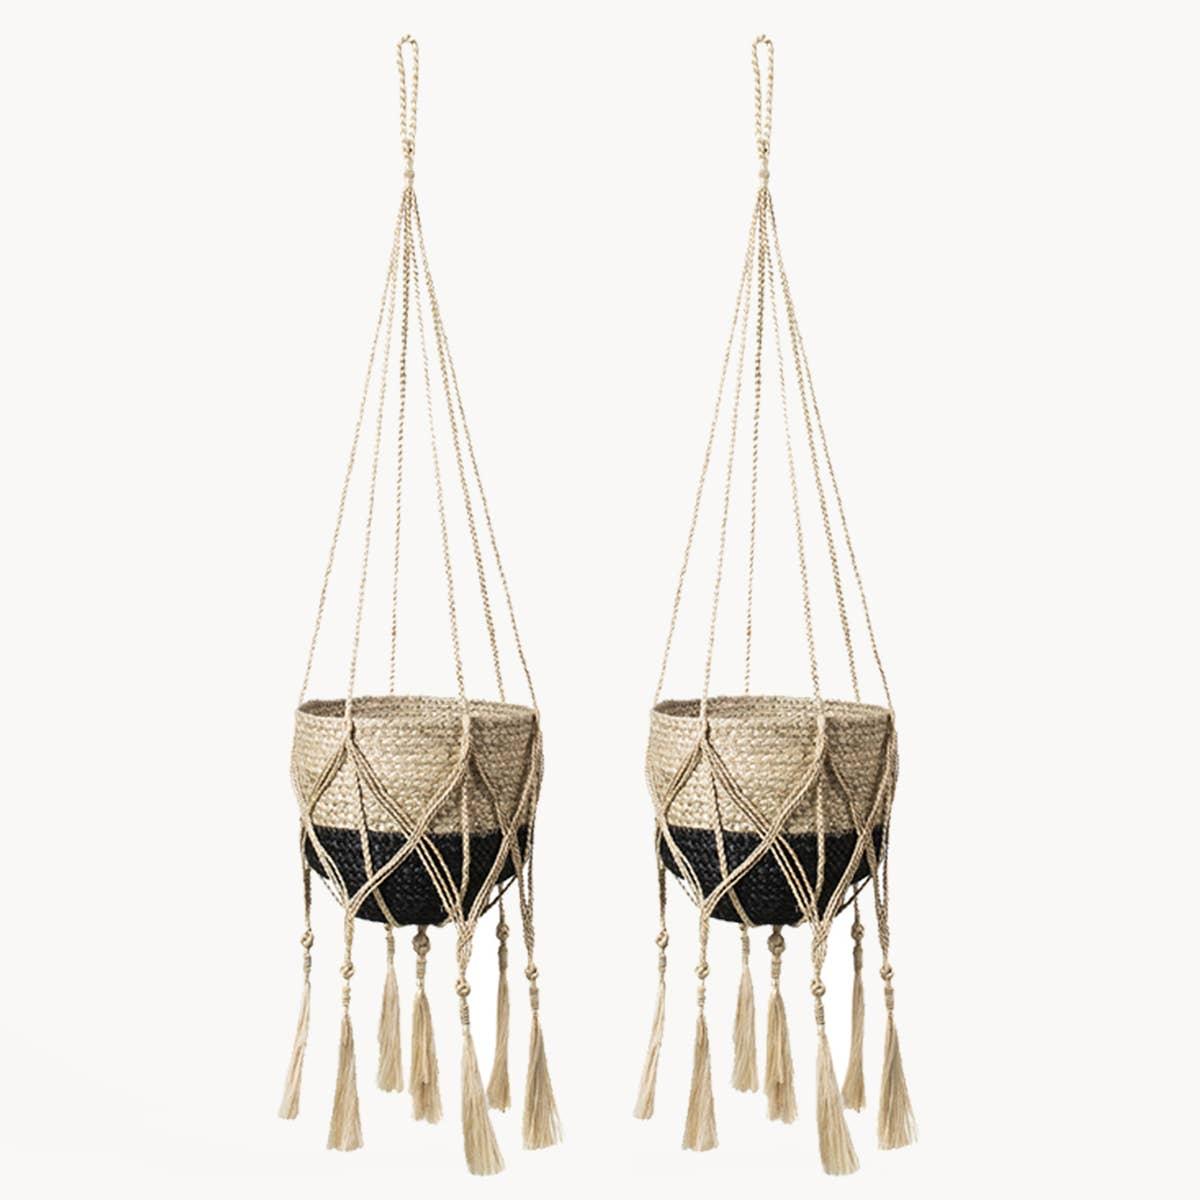 Plant Hanger - Bitan (Set of 2) | Trada Marketplace